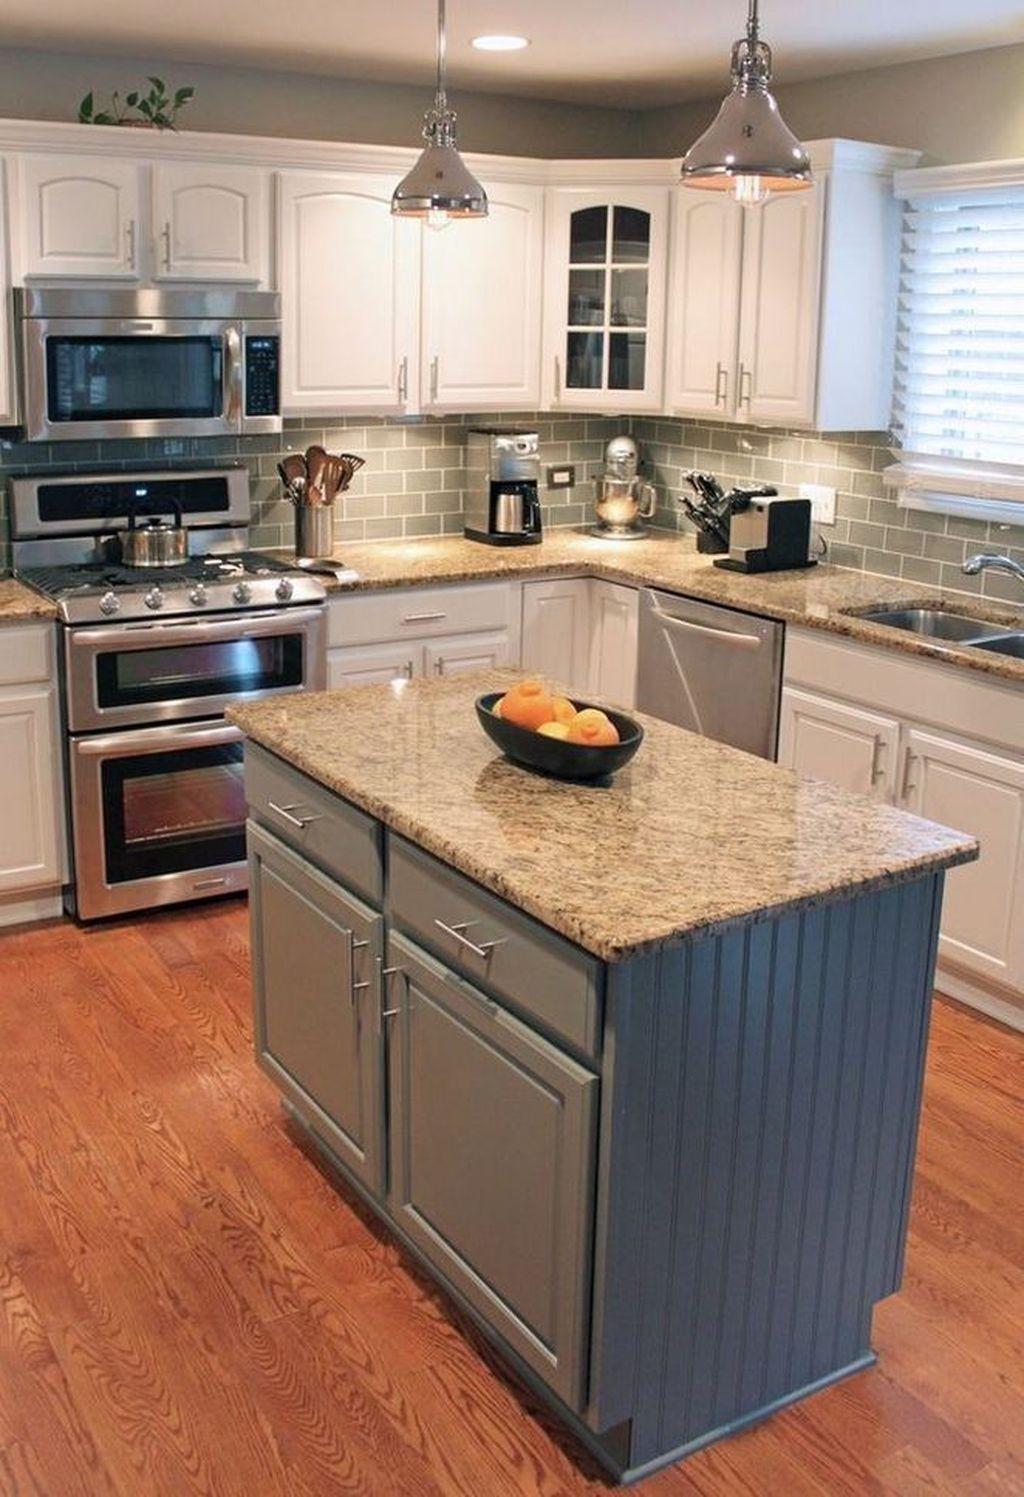 9+ Astonishing Kitchen Remodeling Ideas On A Budget   Kitchen ...